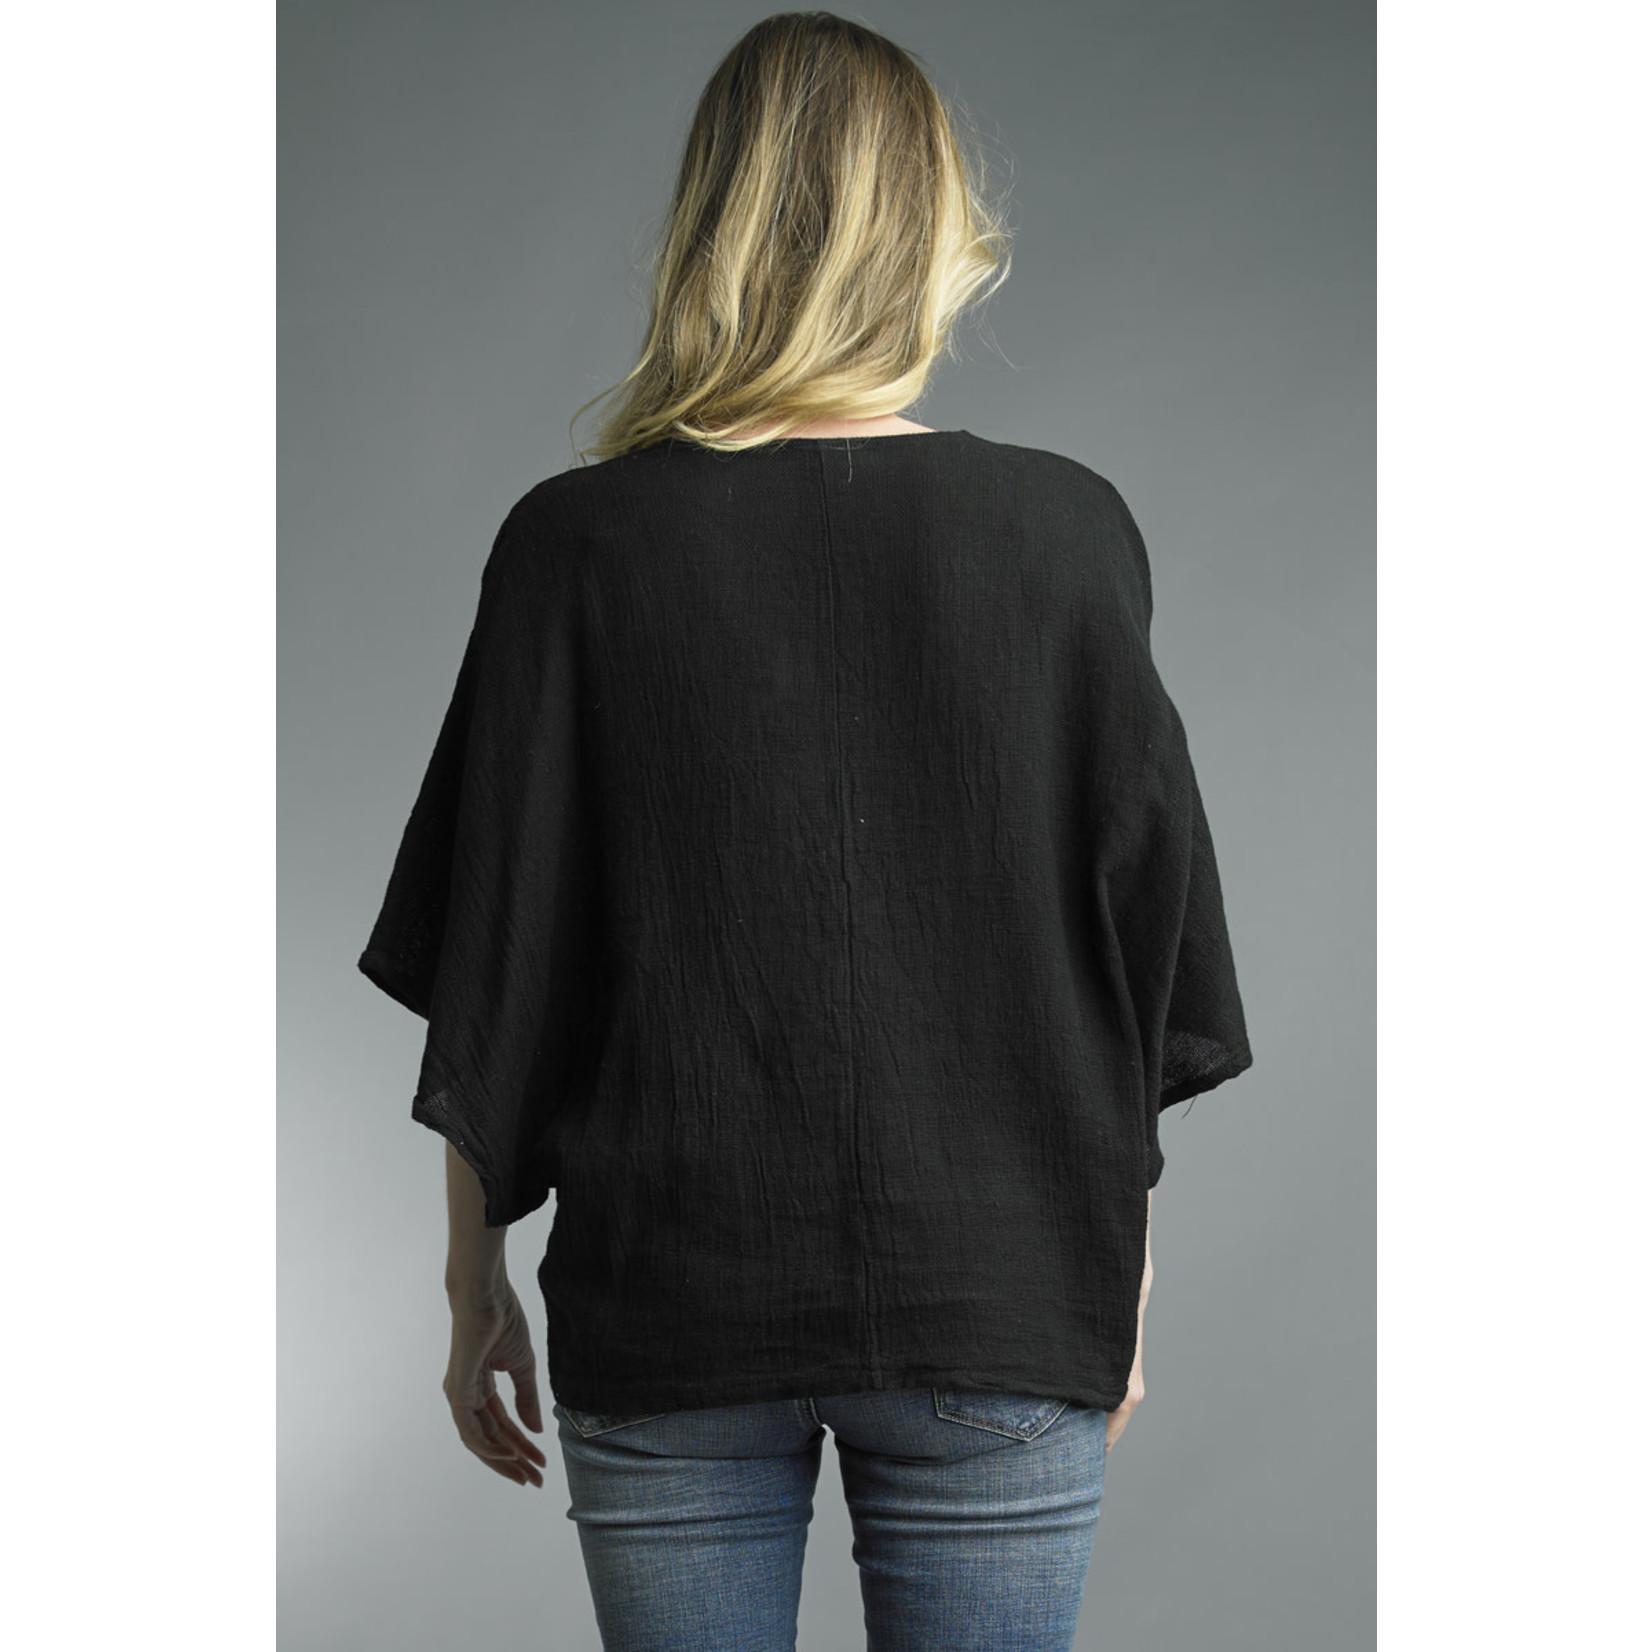 Tempo Paris Black Linen Oversized V-neck Tee w/ Dolman Sleeves